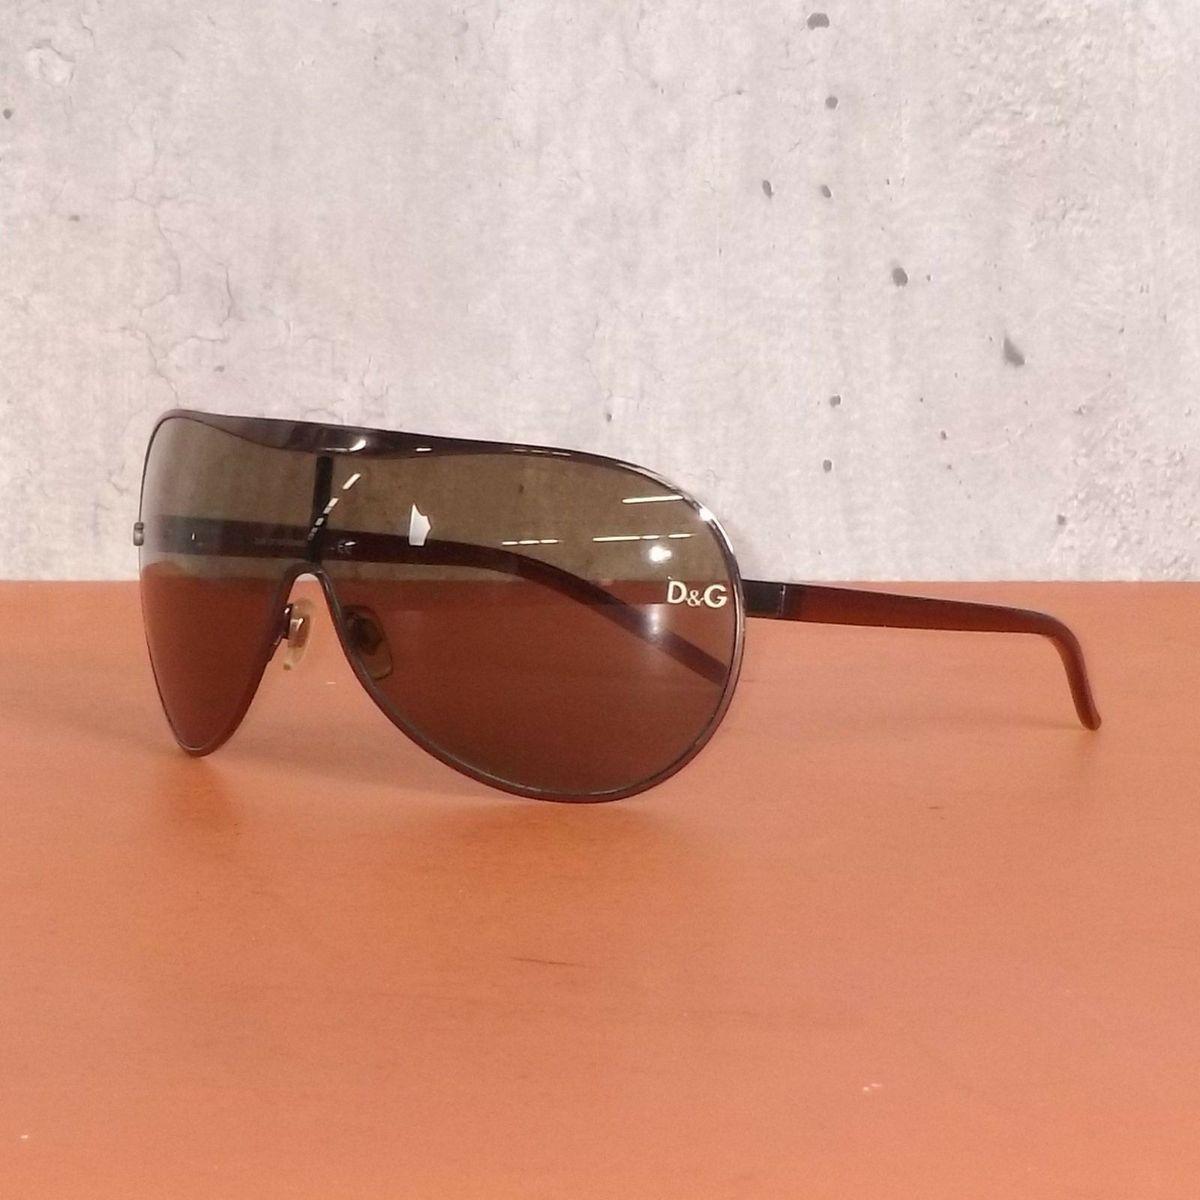 óculos bronze - óculos dolce   gabbana.  Czm6ly9wag90b3muzw5qb2vplmnvbs5ici9wcm9kdwn0cy83mzk0mtqxlzjmzdvmm2qzmta0ztyzmtyzzjeyytqxymm3ndbjmwexlmpwzw  ... cb8920246c